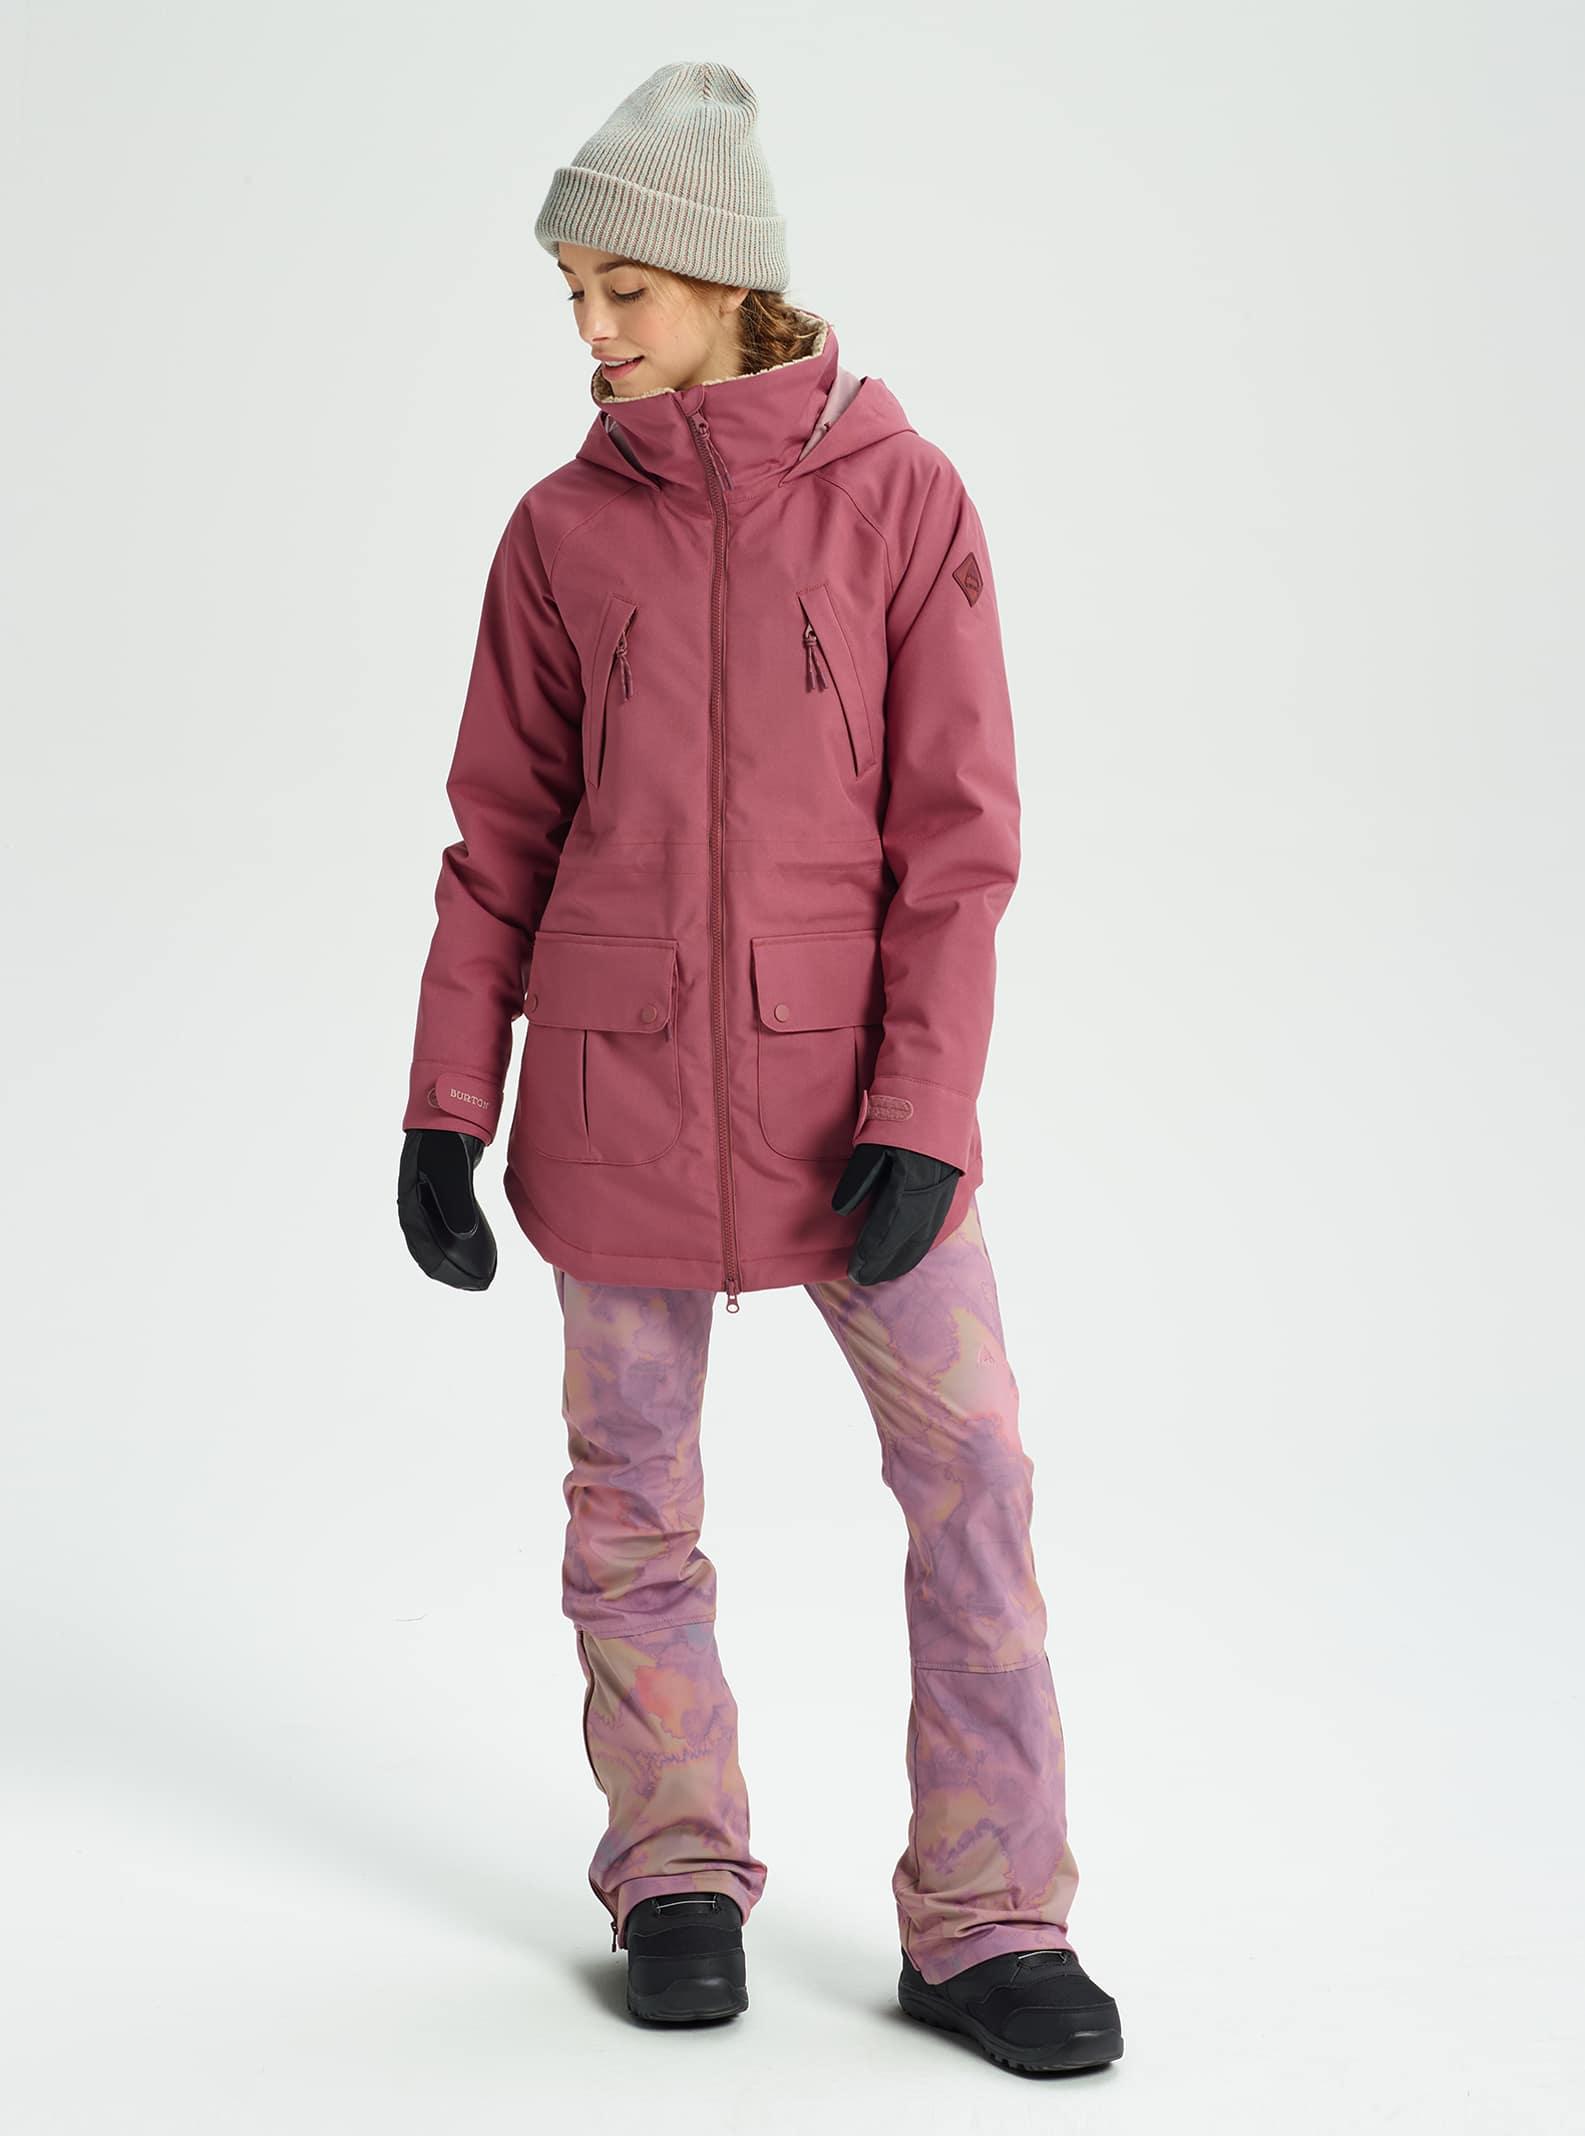 bc1dda9ac Women s Snowboard Jackets